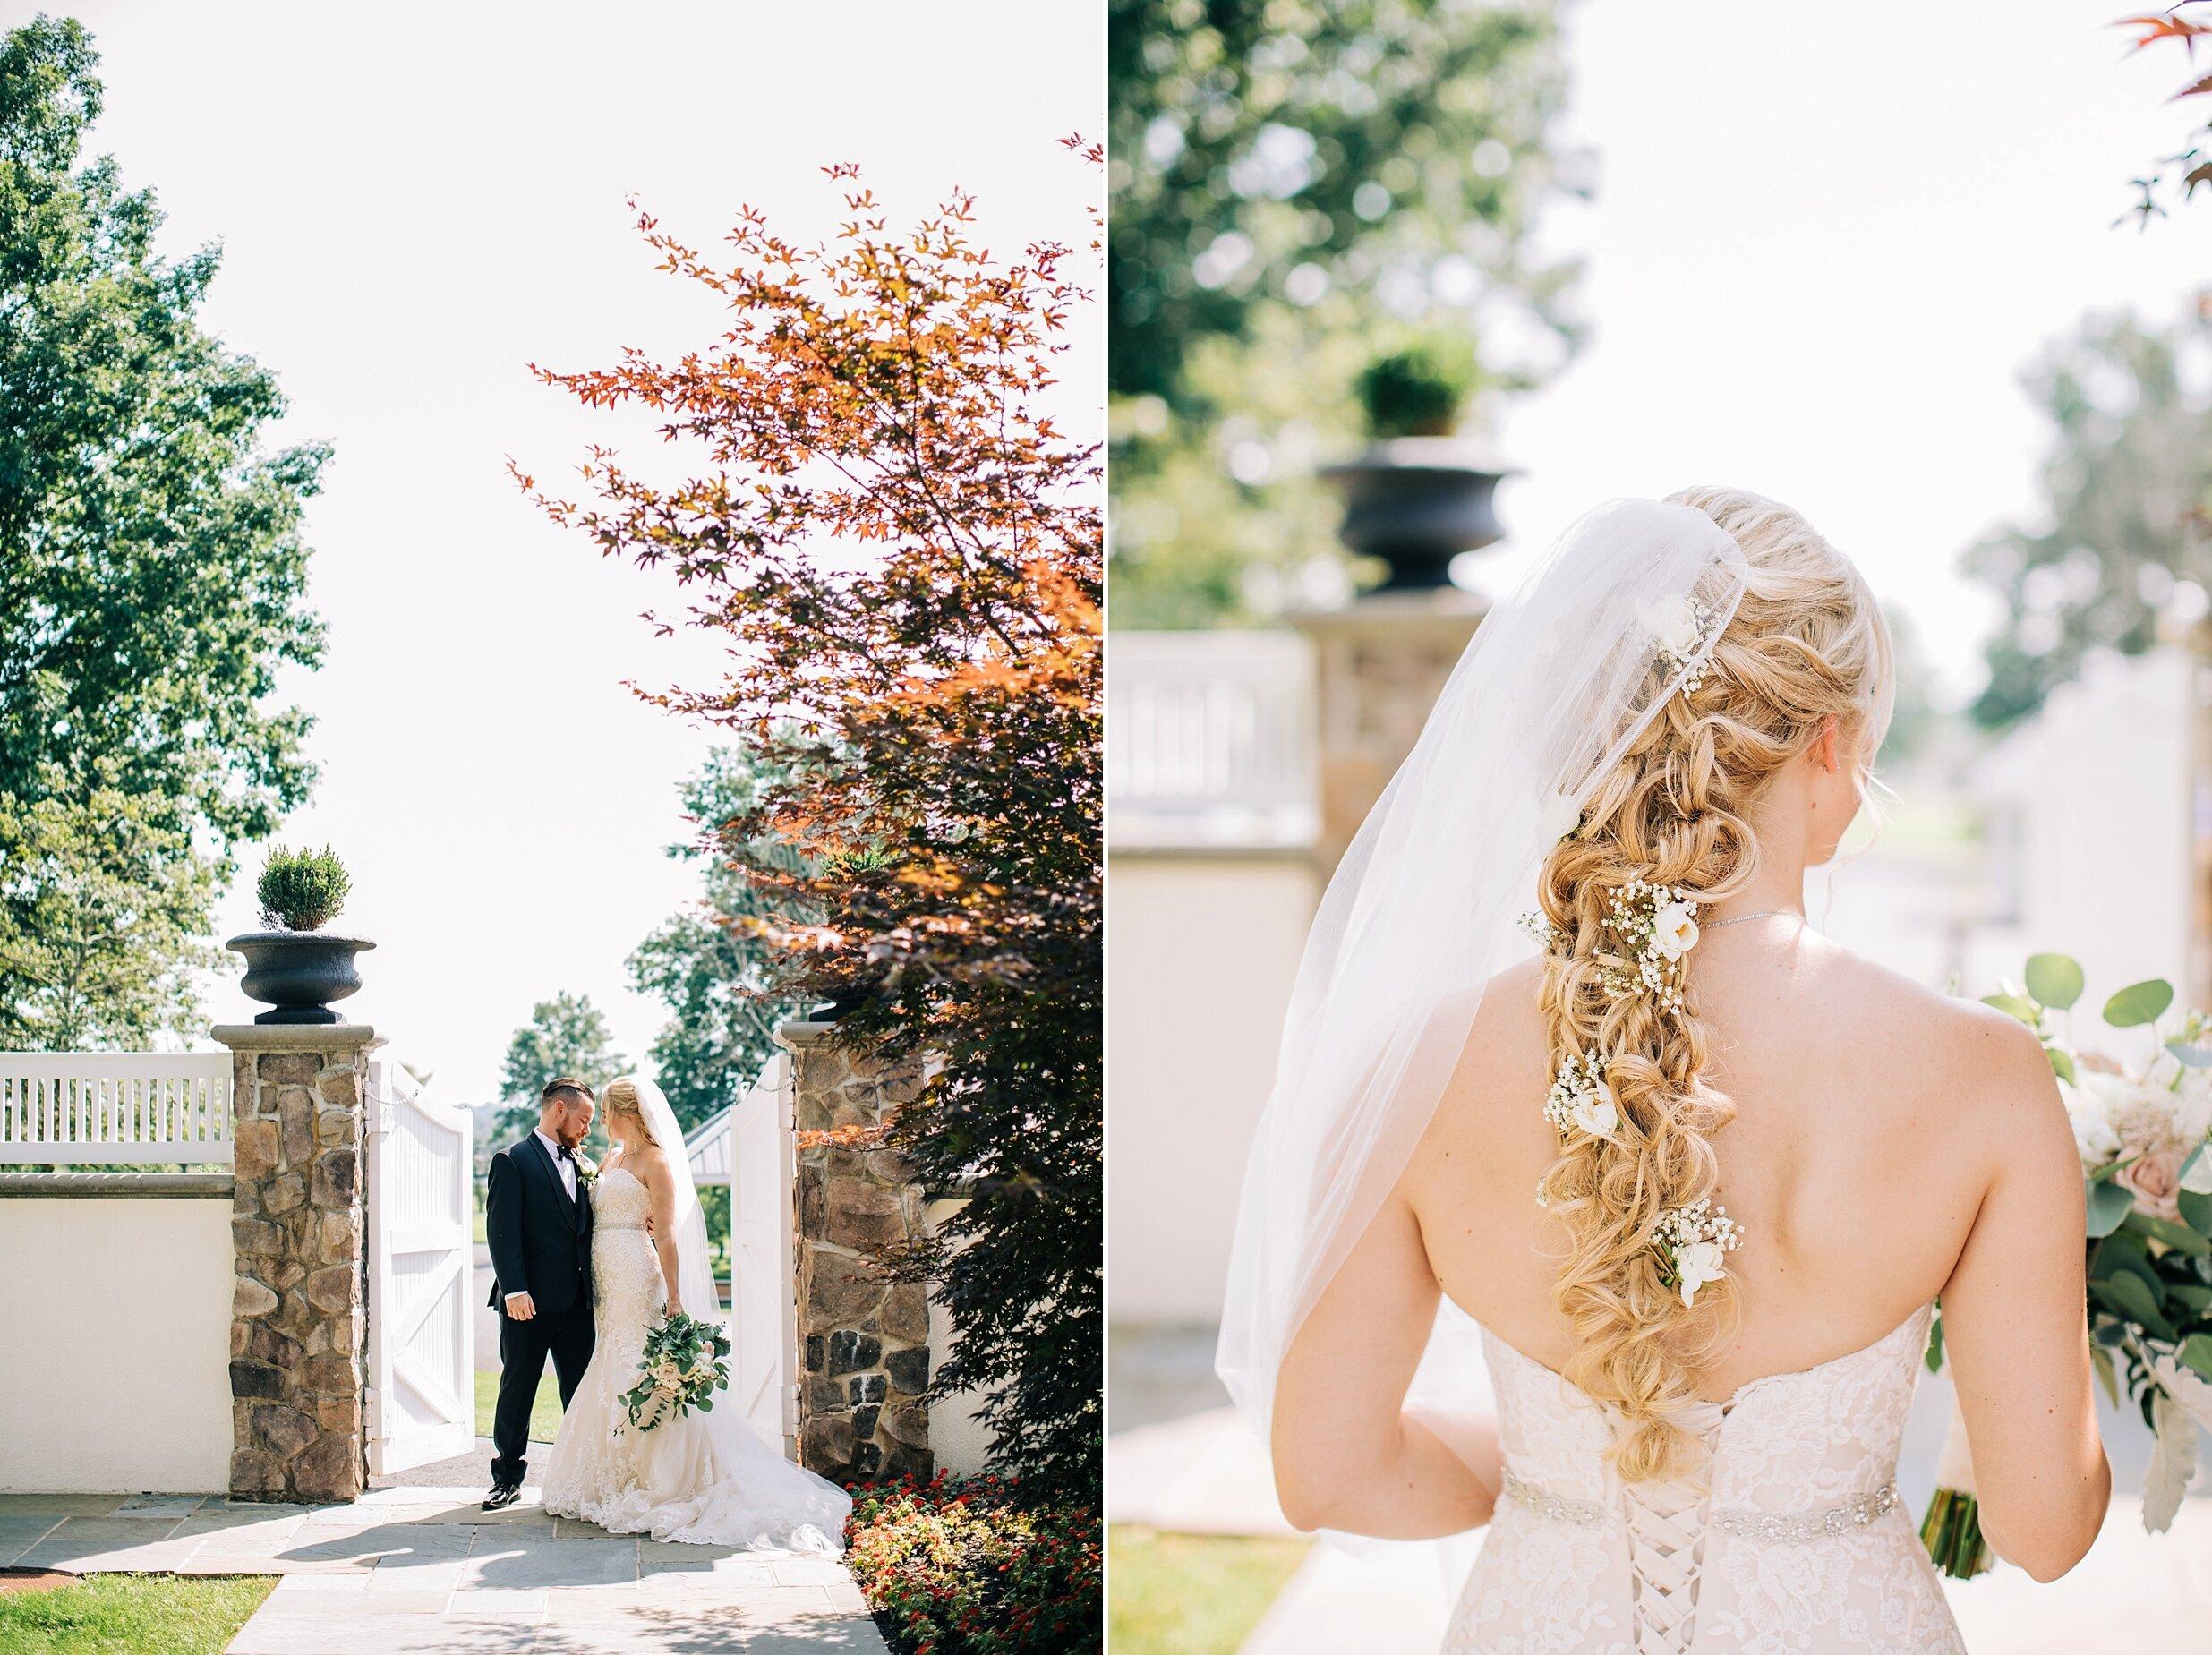 ryland-inn-nj-photographer-wedding_0044.jpg